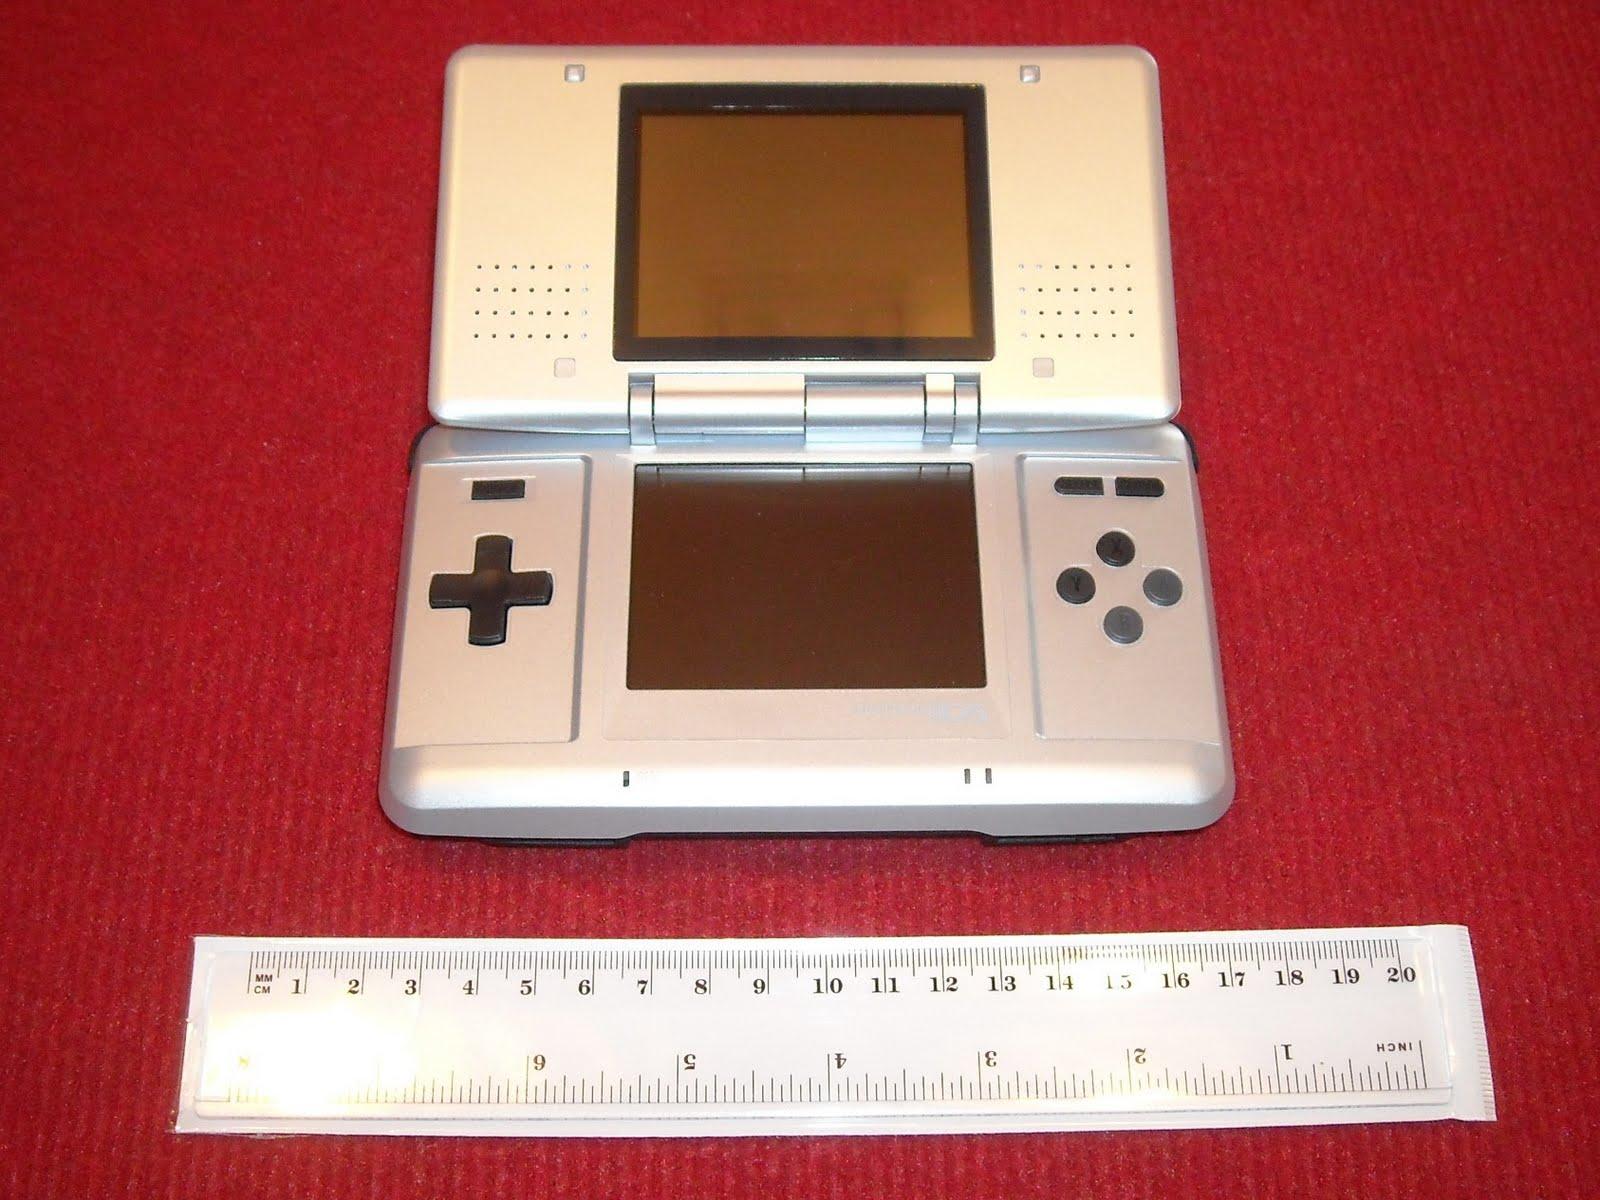 nintendo dsi slot 2 online casino portal rh dzack ga Nintendo DSi Charger Nintendo DSi XL